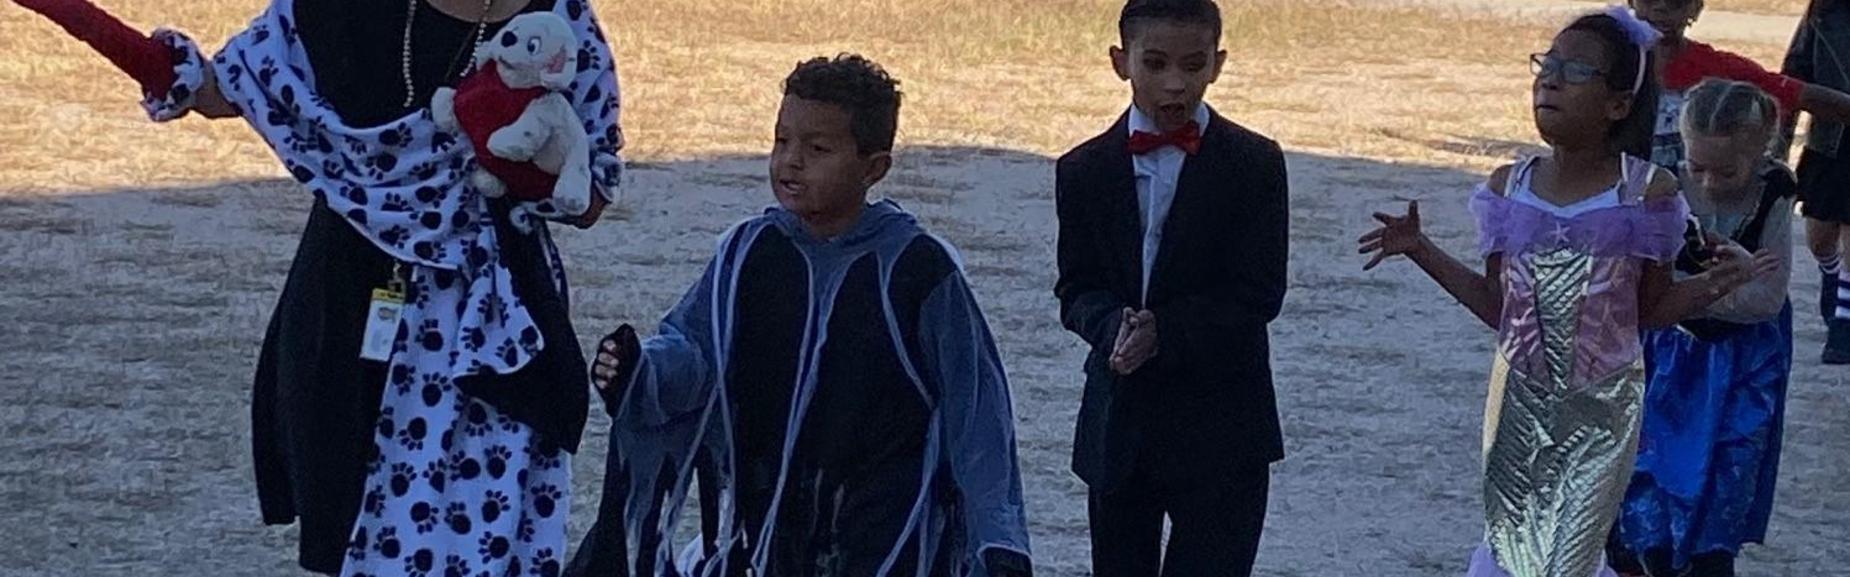 children dressed for Halloween